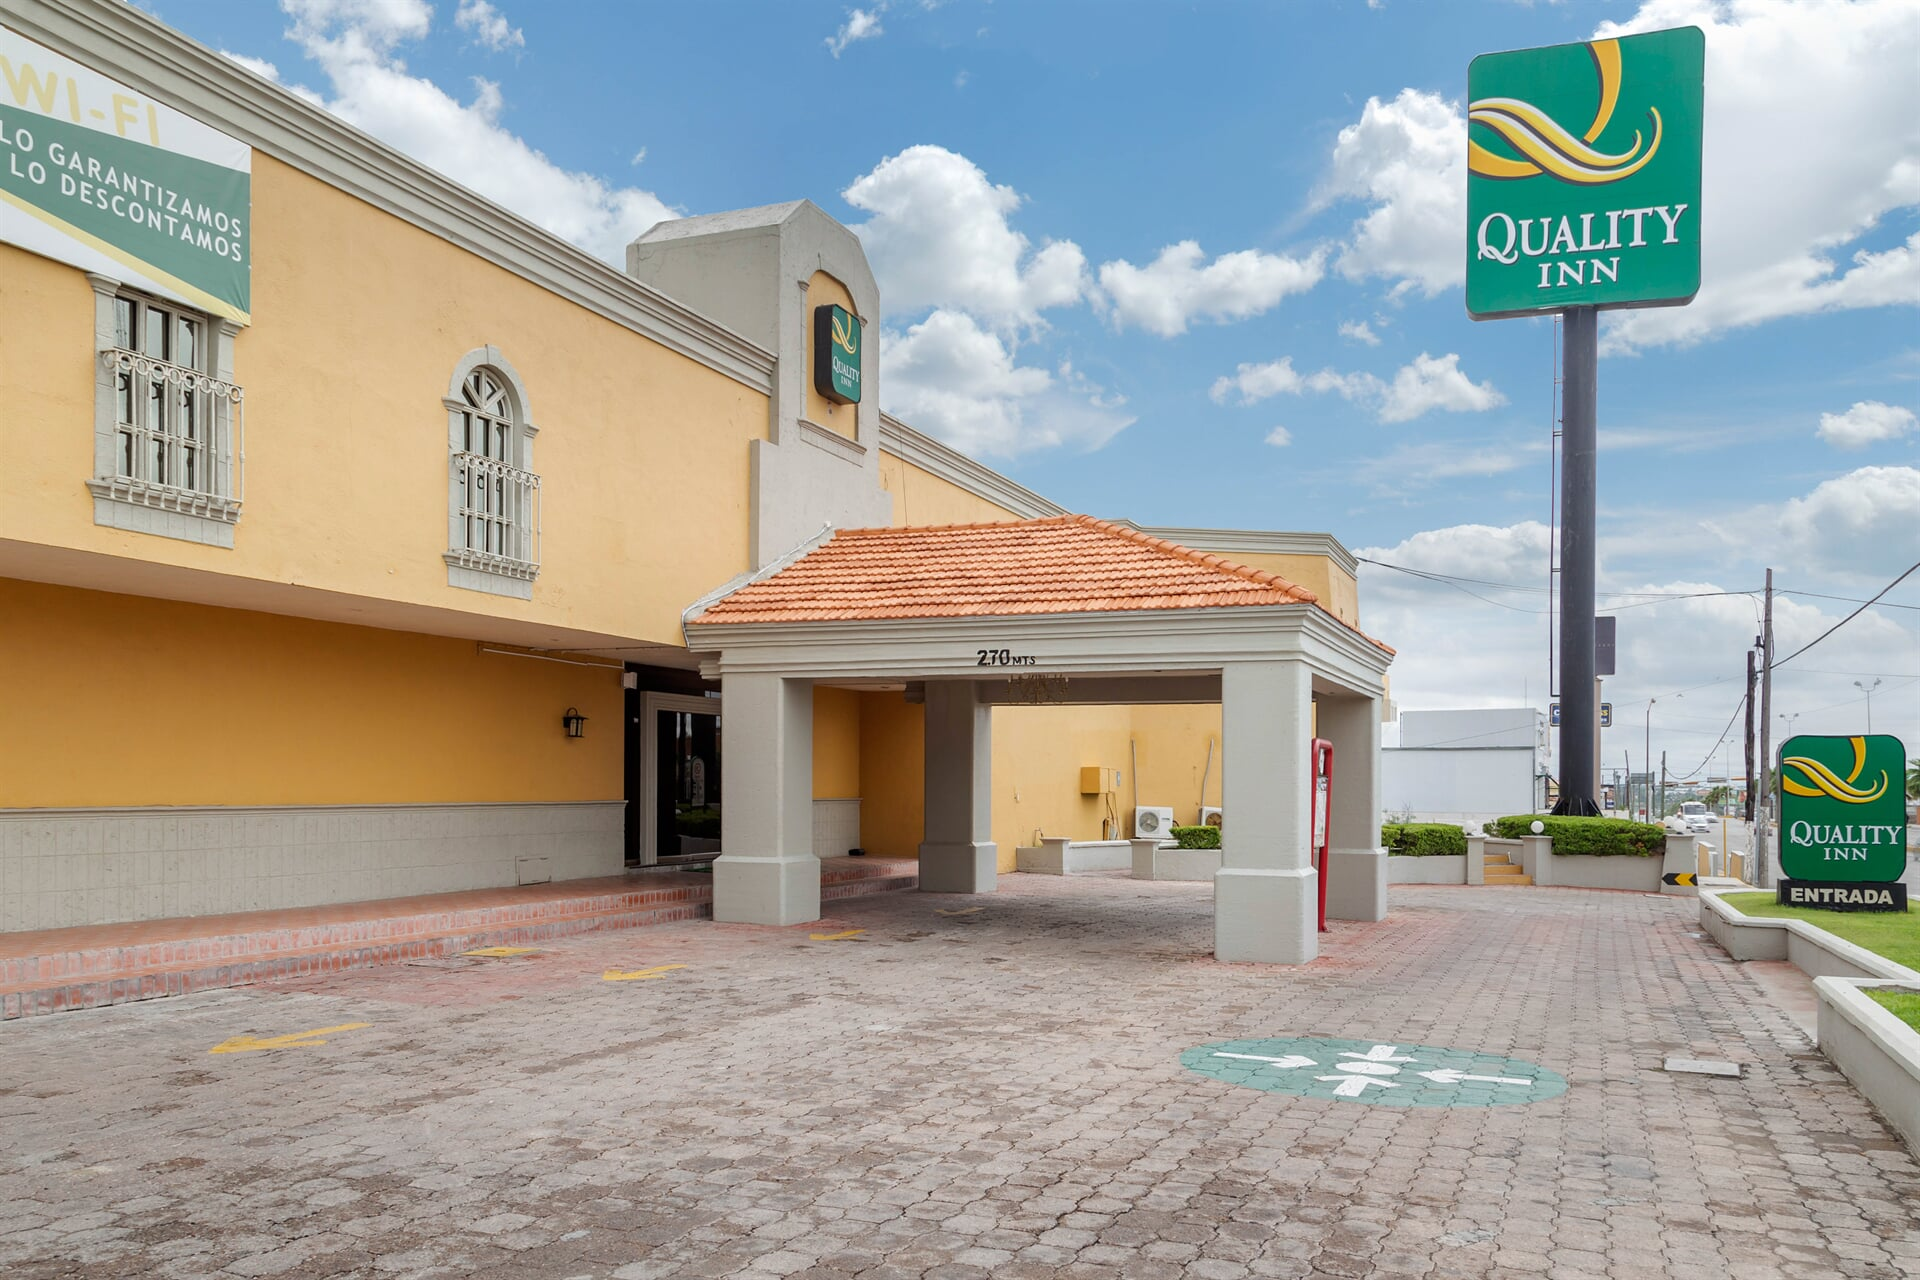 QUALITY INN- hotel en Piedras Negras